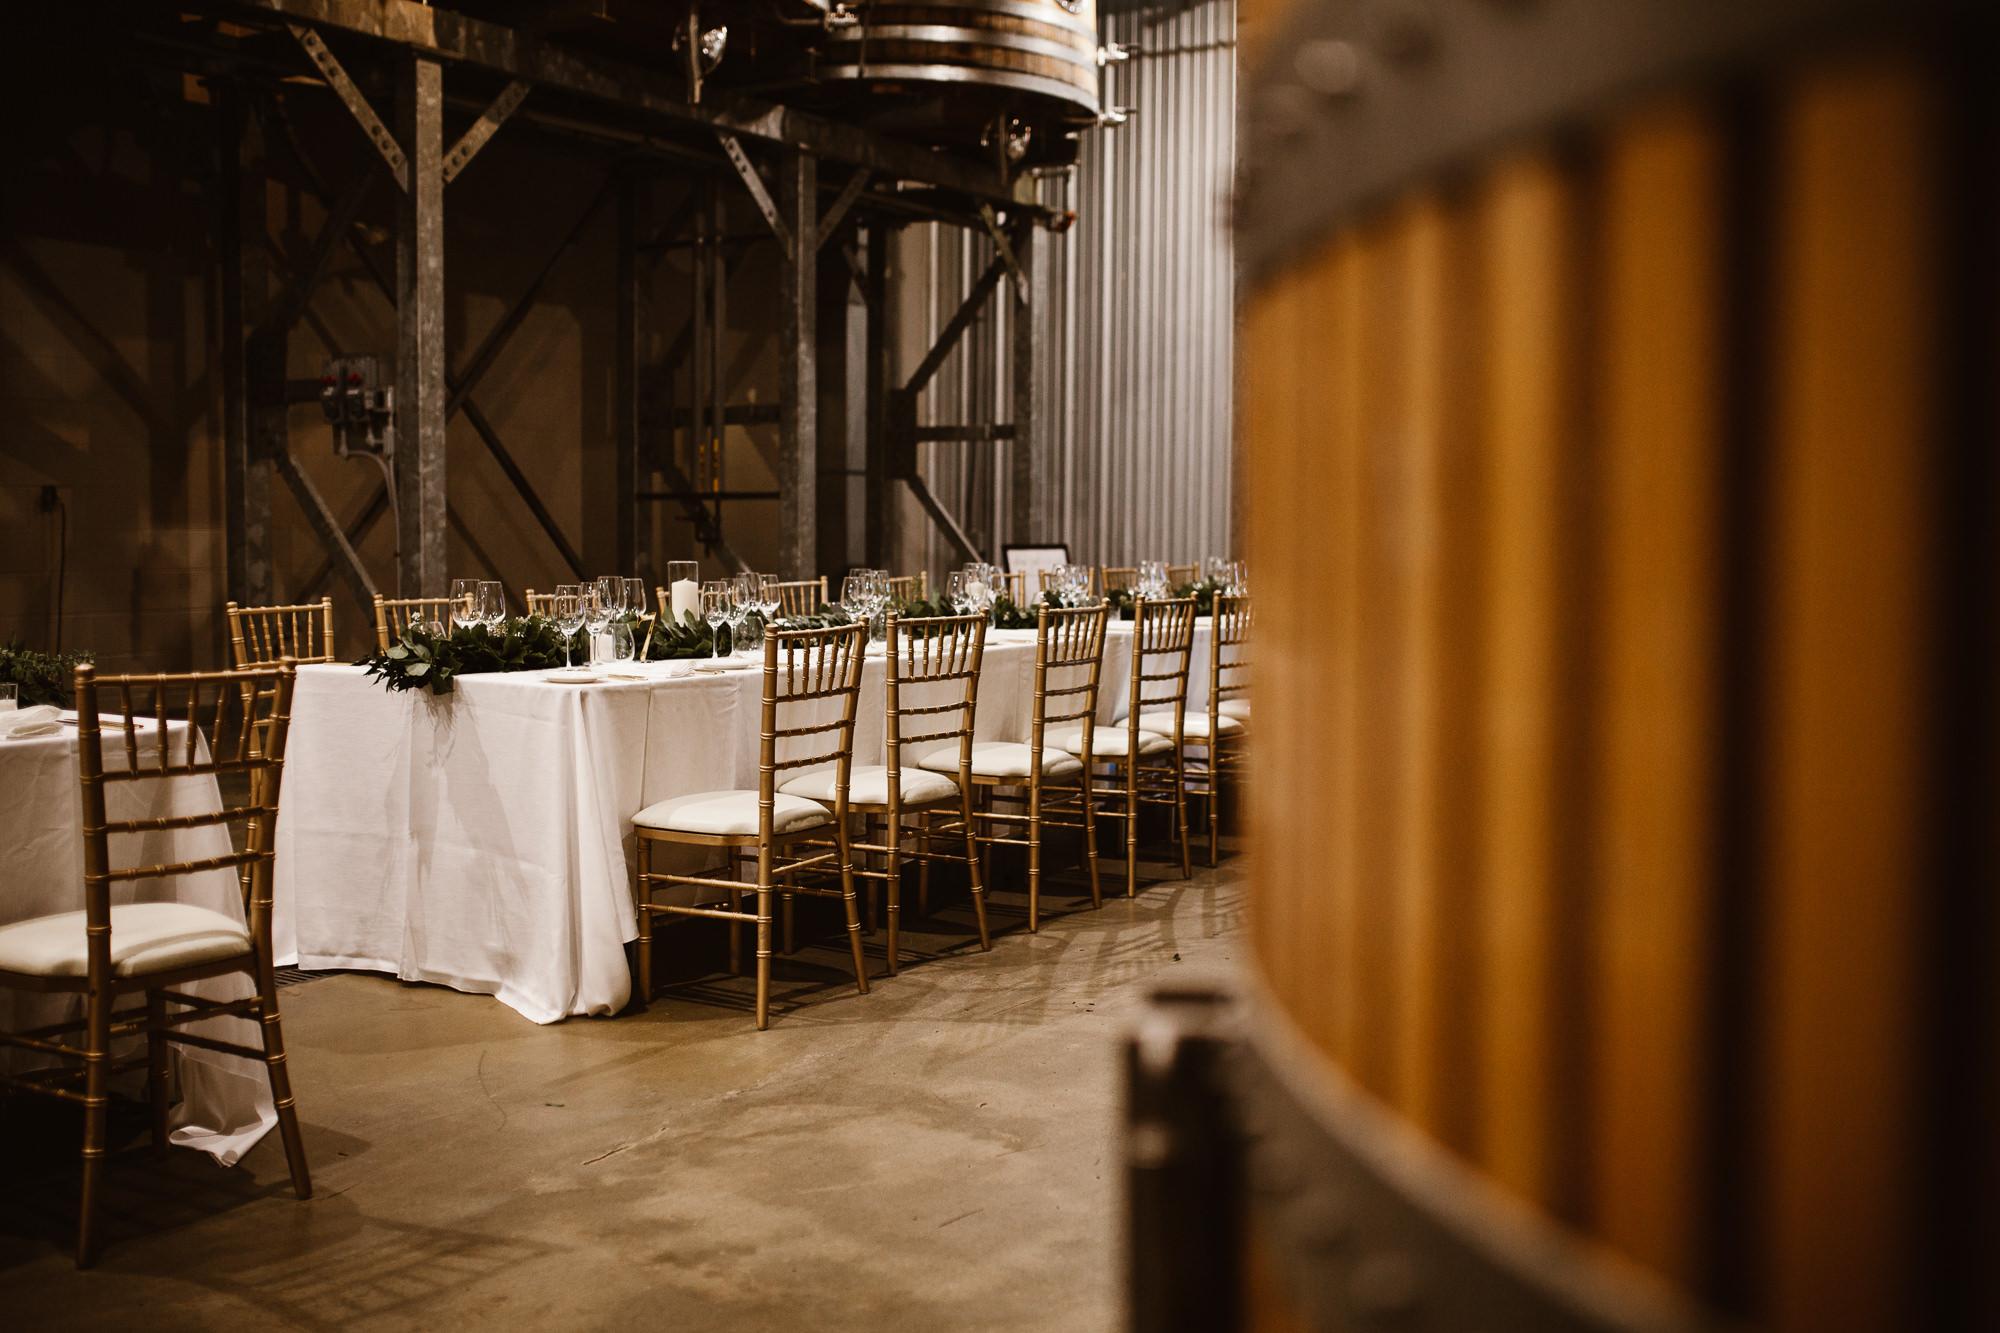 stratus-winery-wedding-vineyard-wedding-vineyard-bride-photo-by-reed-photography-047.jpg